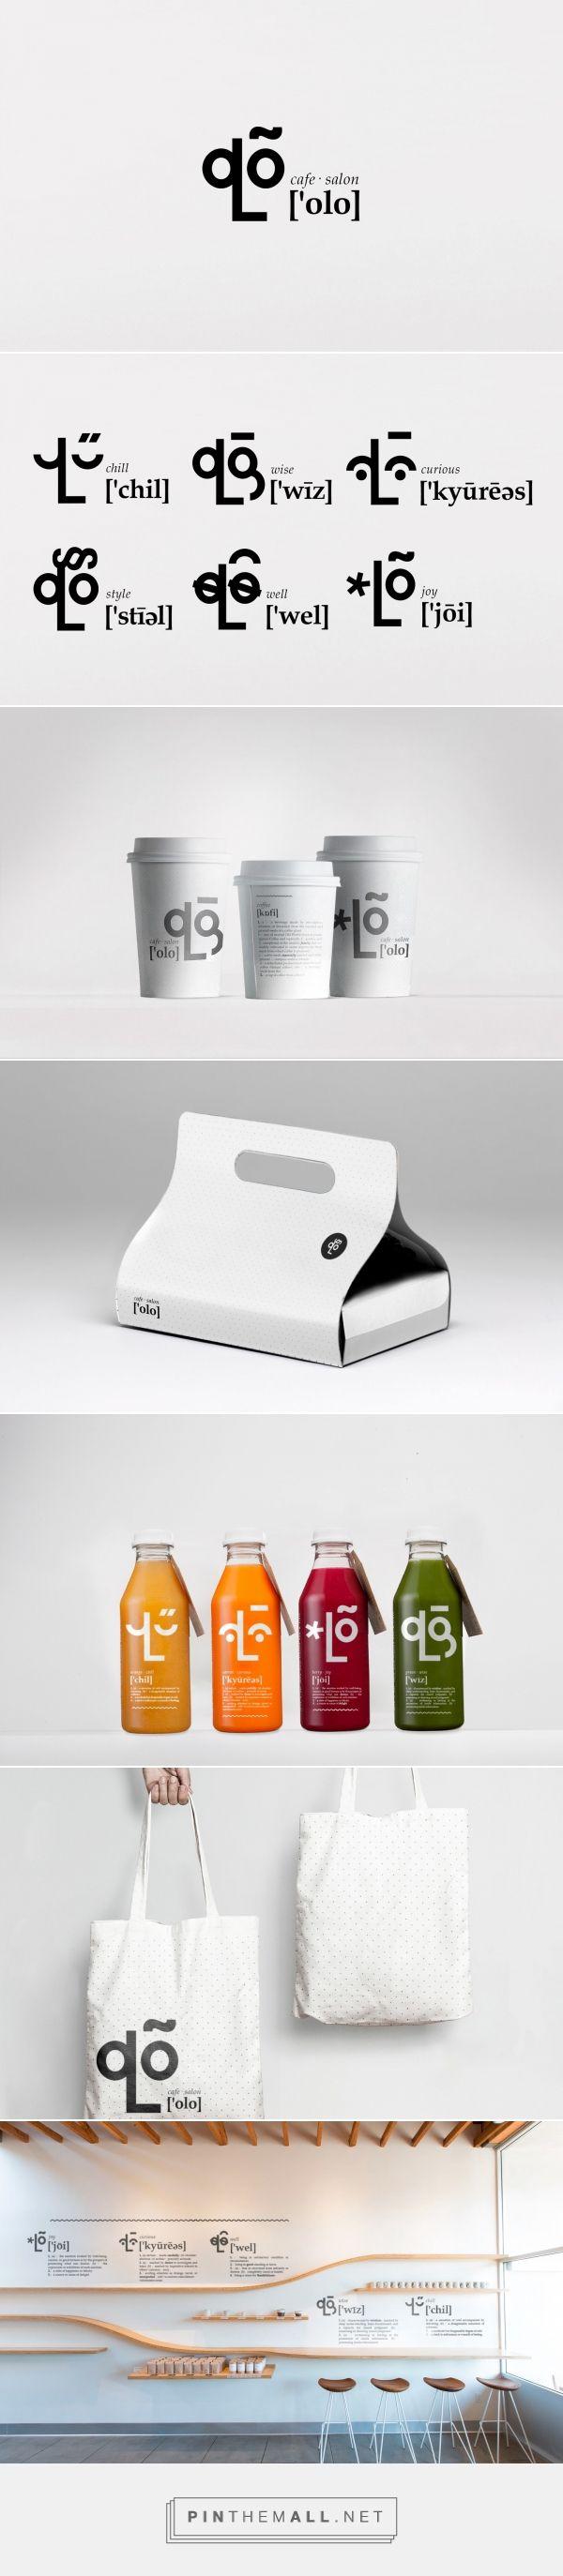 Olo cafe packaging & branding by Steve Solodkov - http://www.packagingoftheworld.com/2017/05/olo.html